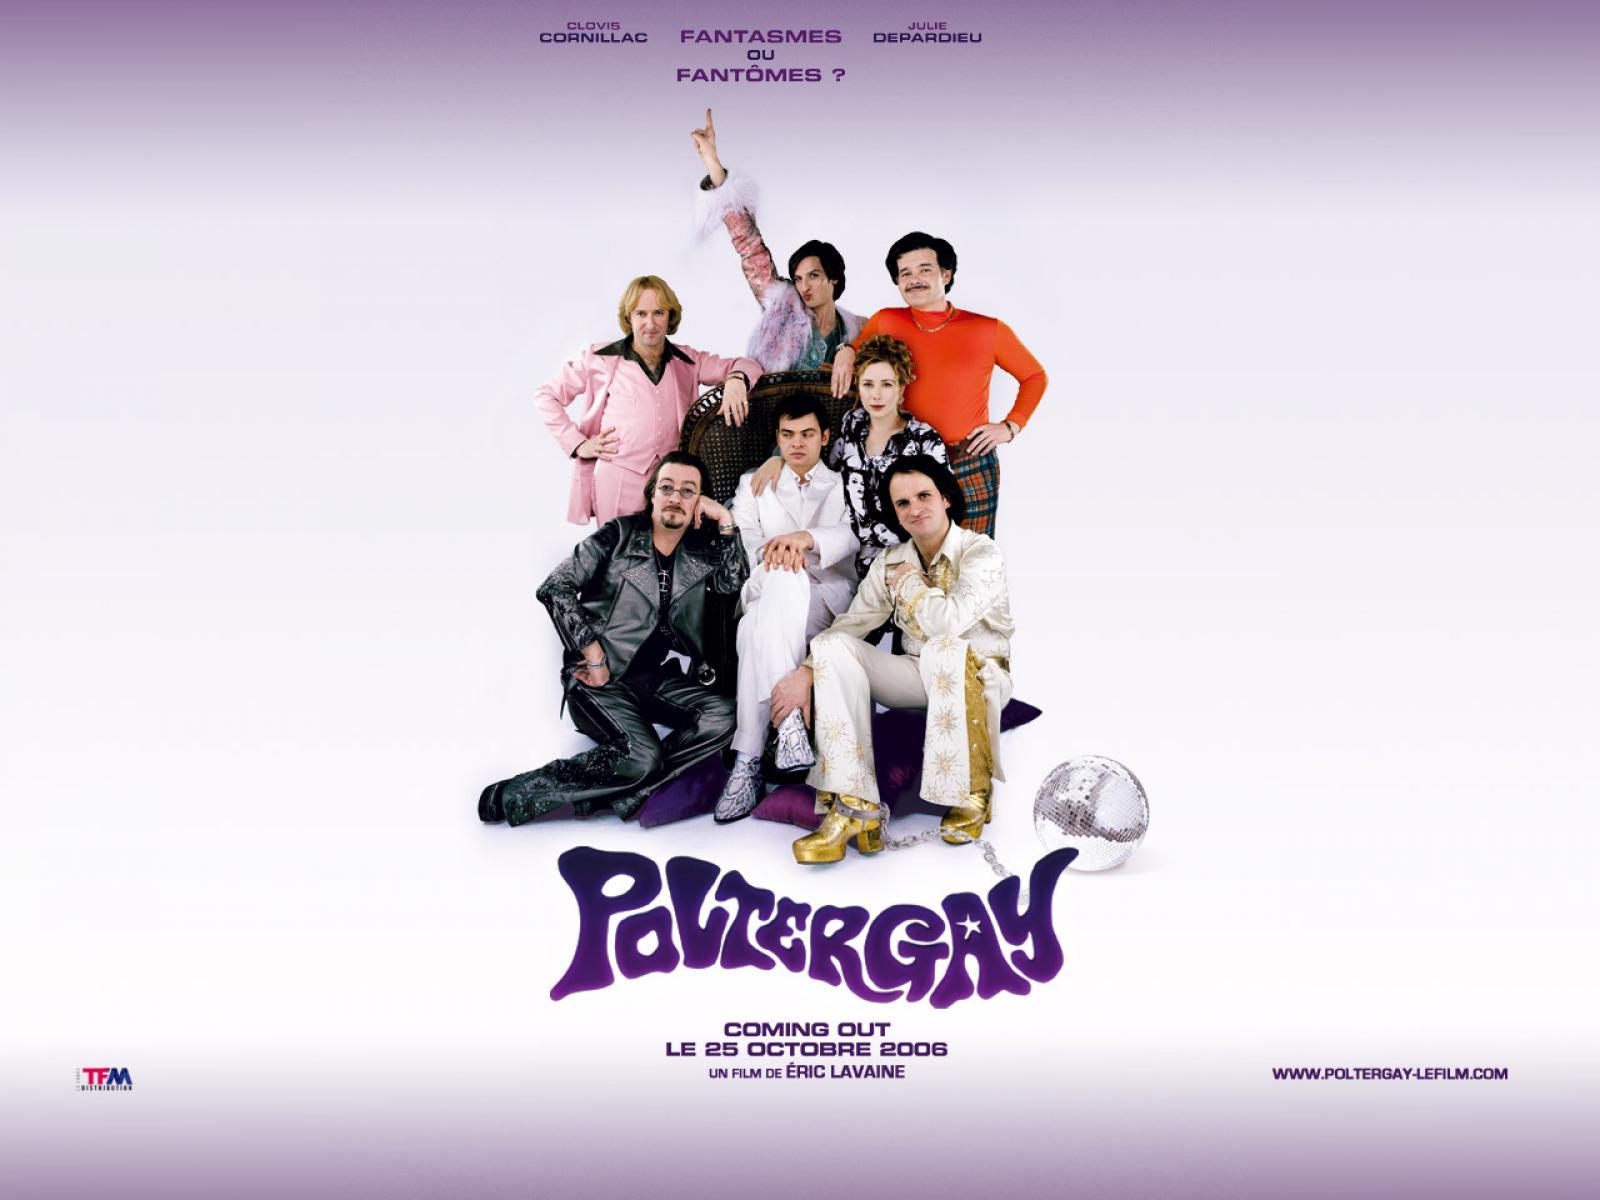 film poltergay